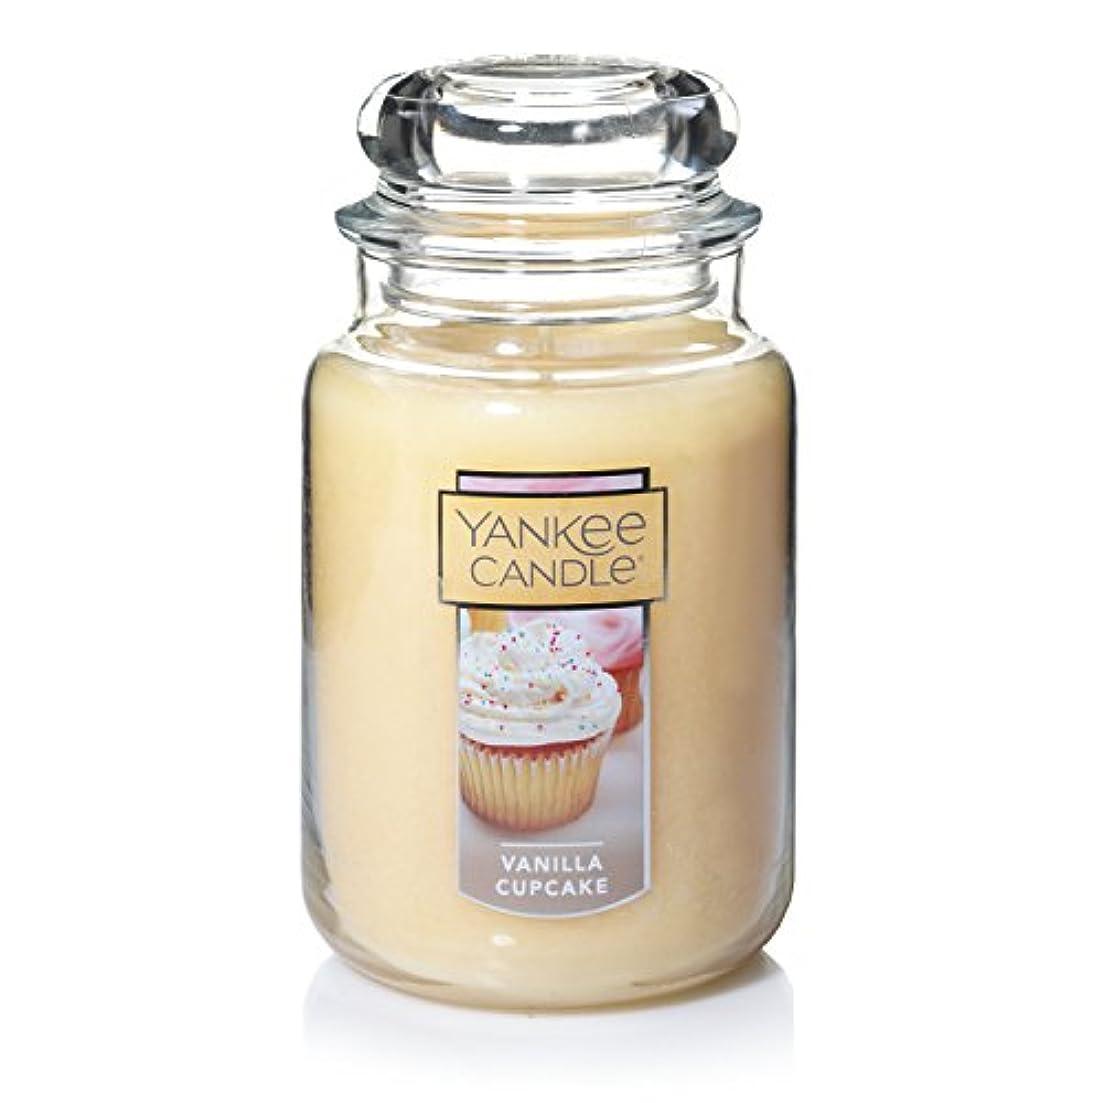 Yankee Candle Company Vanilla Cupcake Large Jar Candle by Yankee Candle